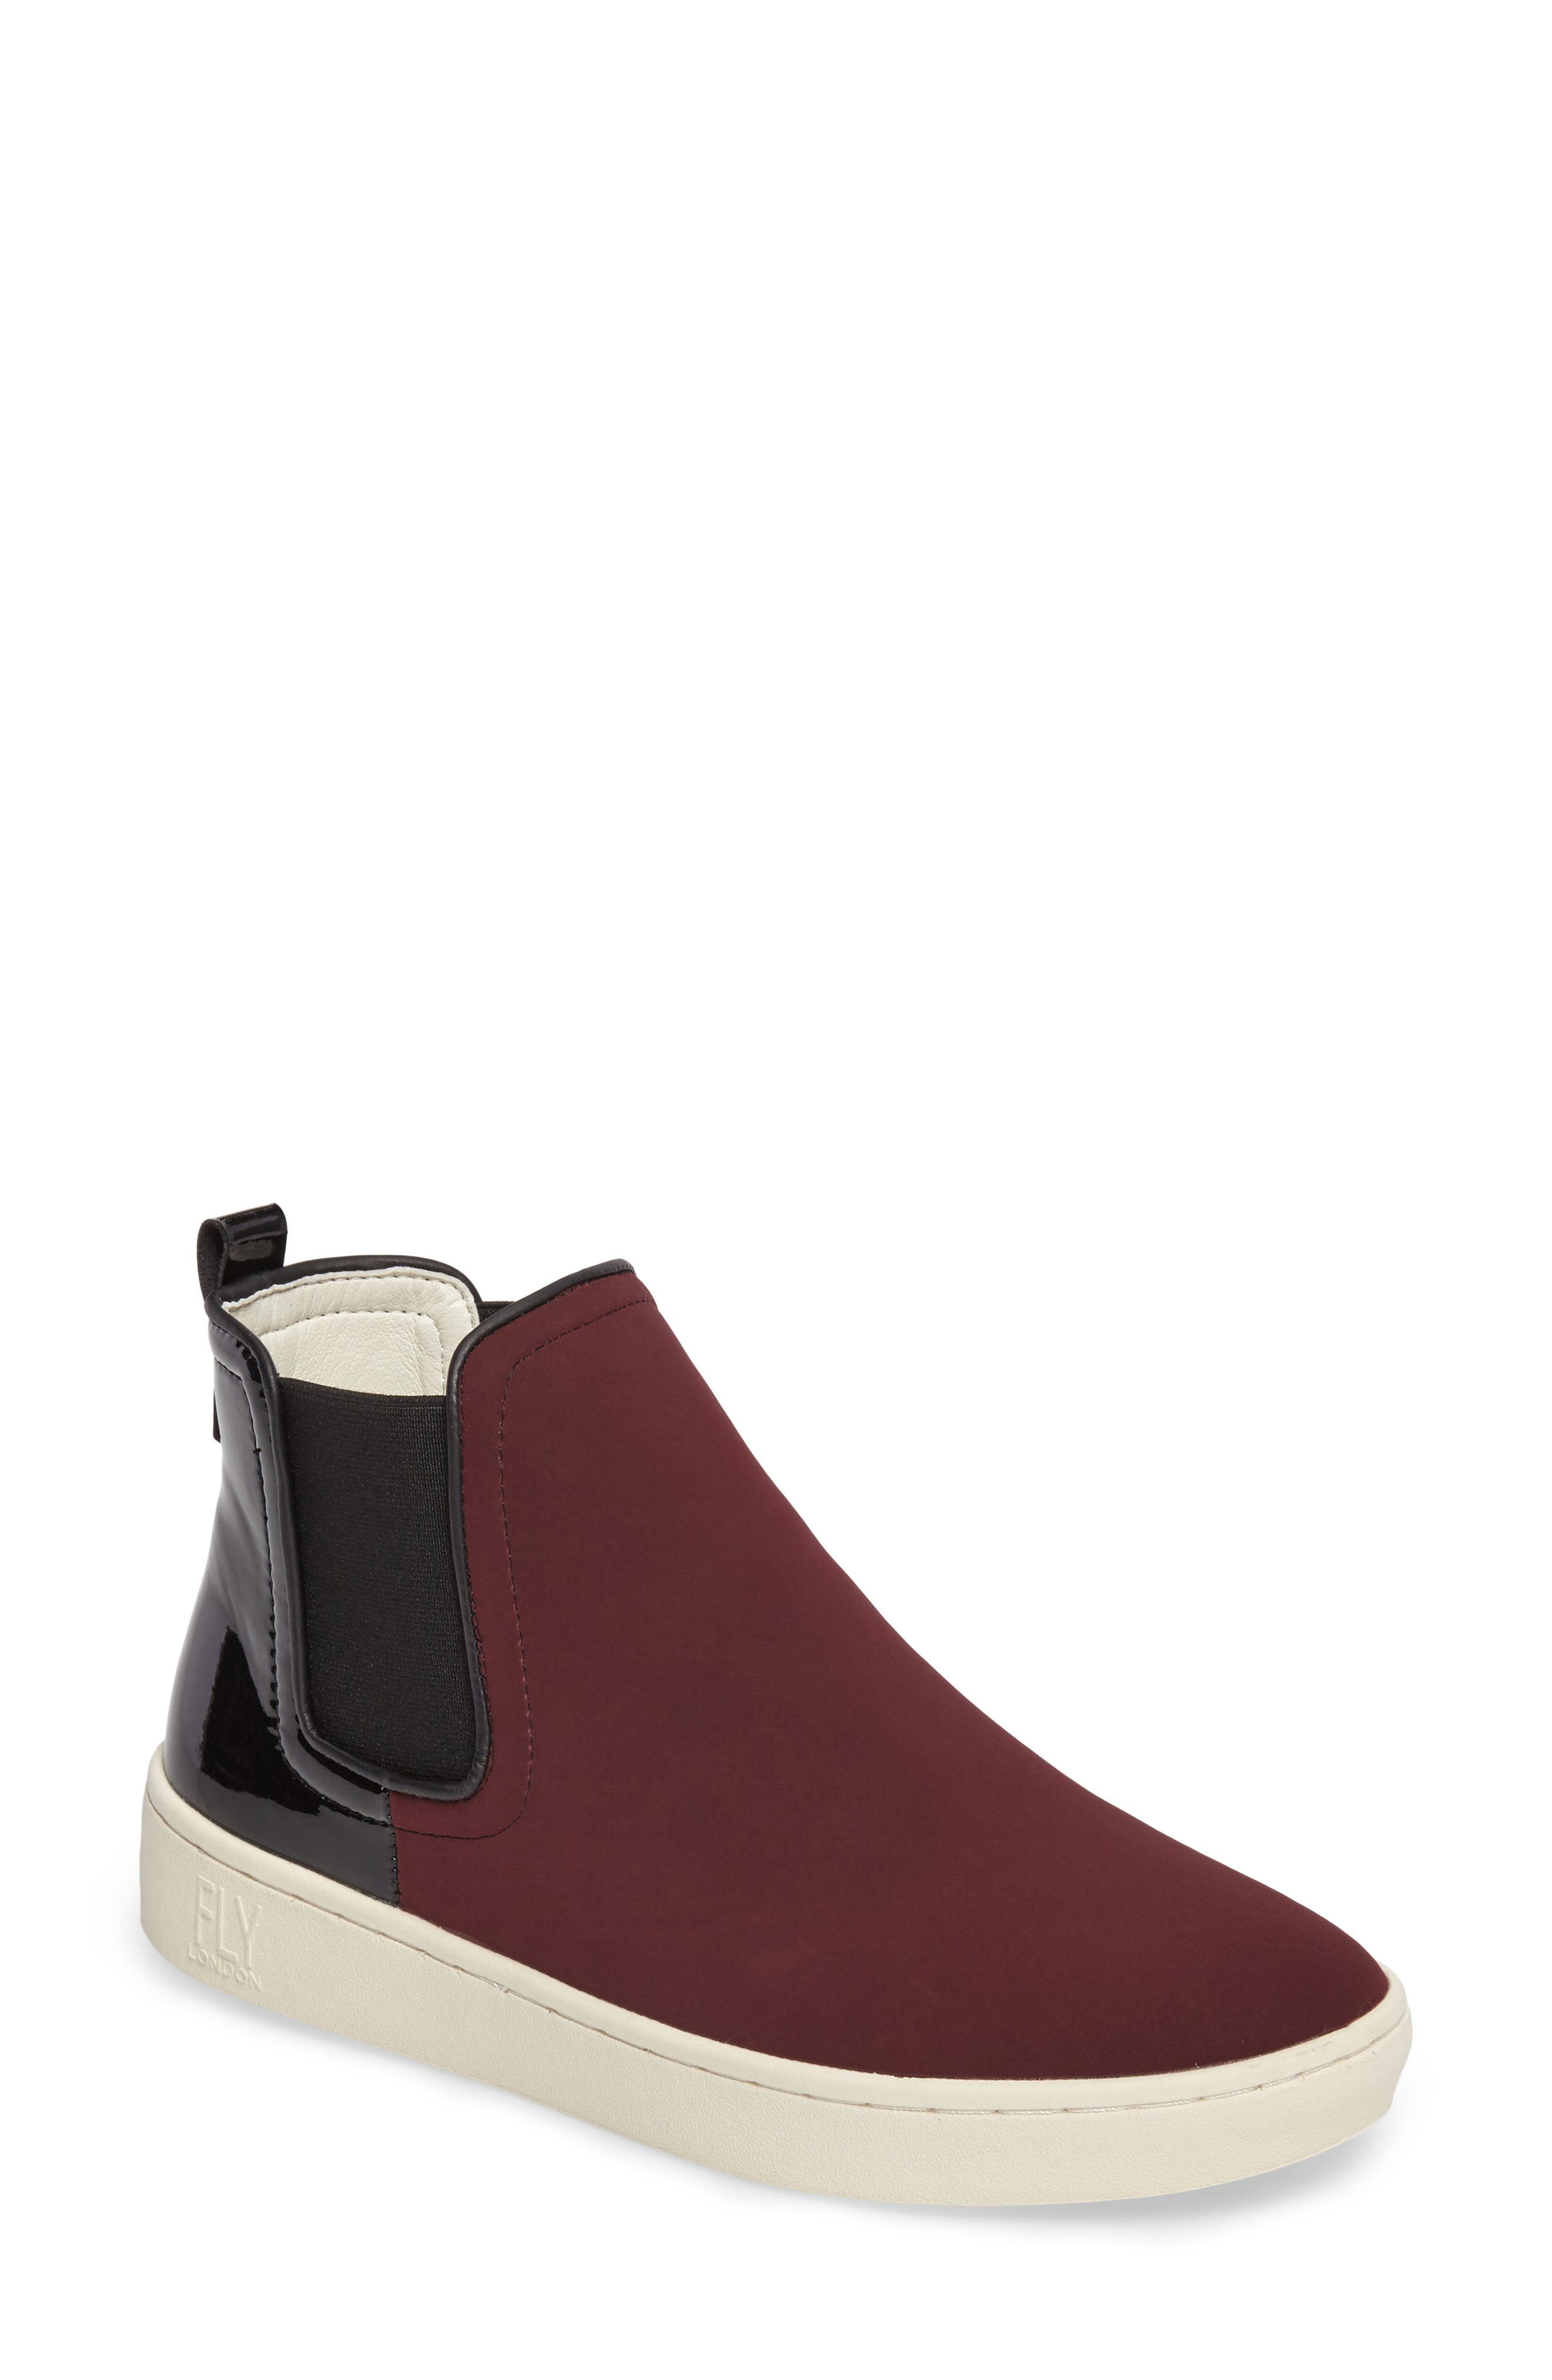 'Mabs' Slip-On Platform Sneaker,                             Main thumbnail 1, color,                             003